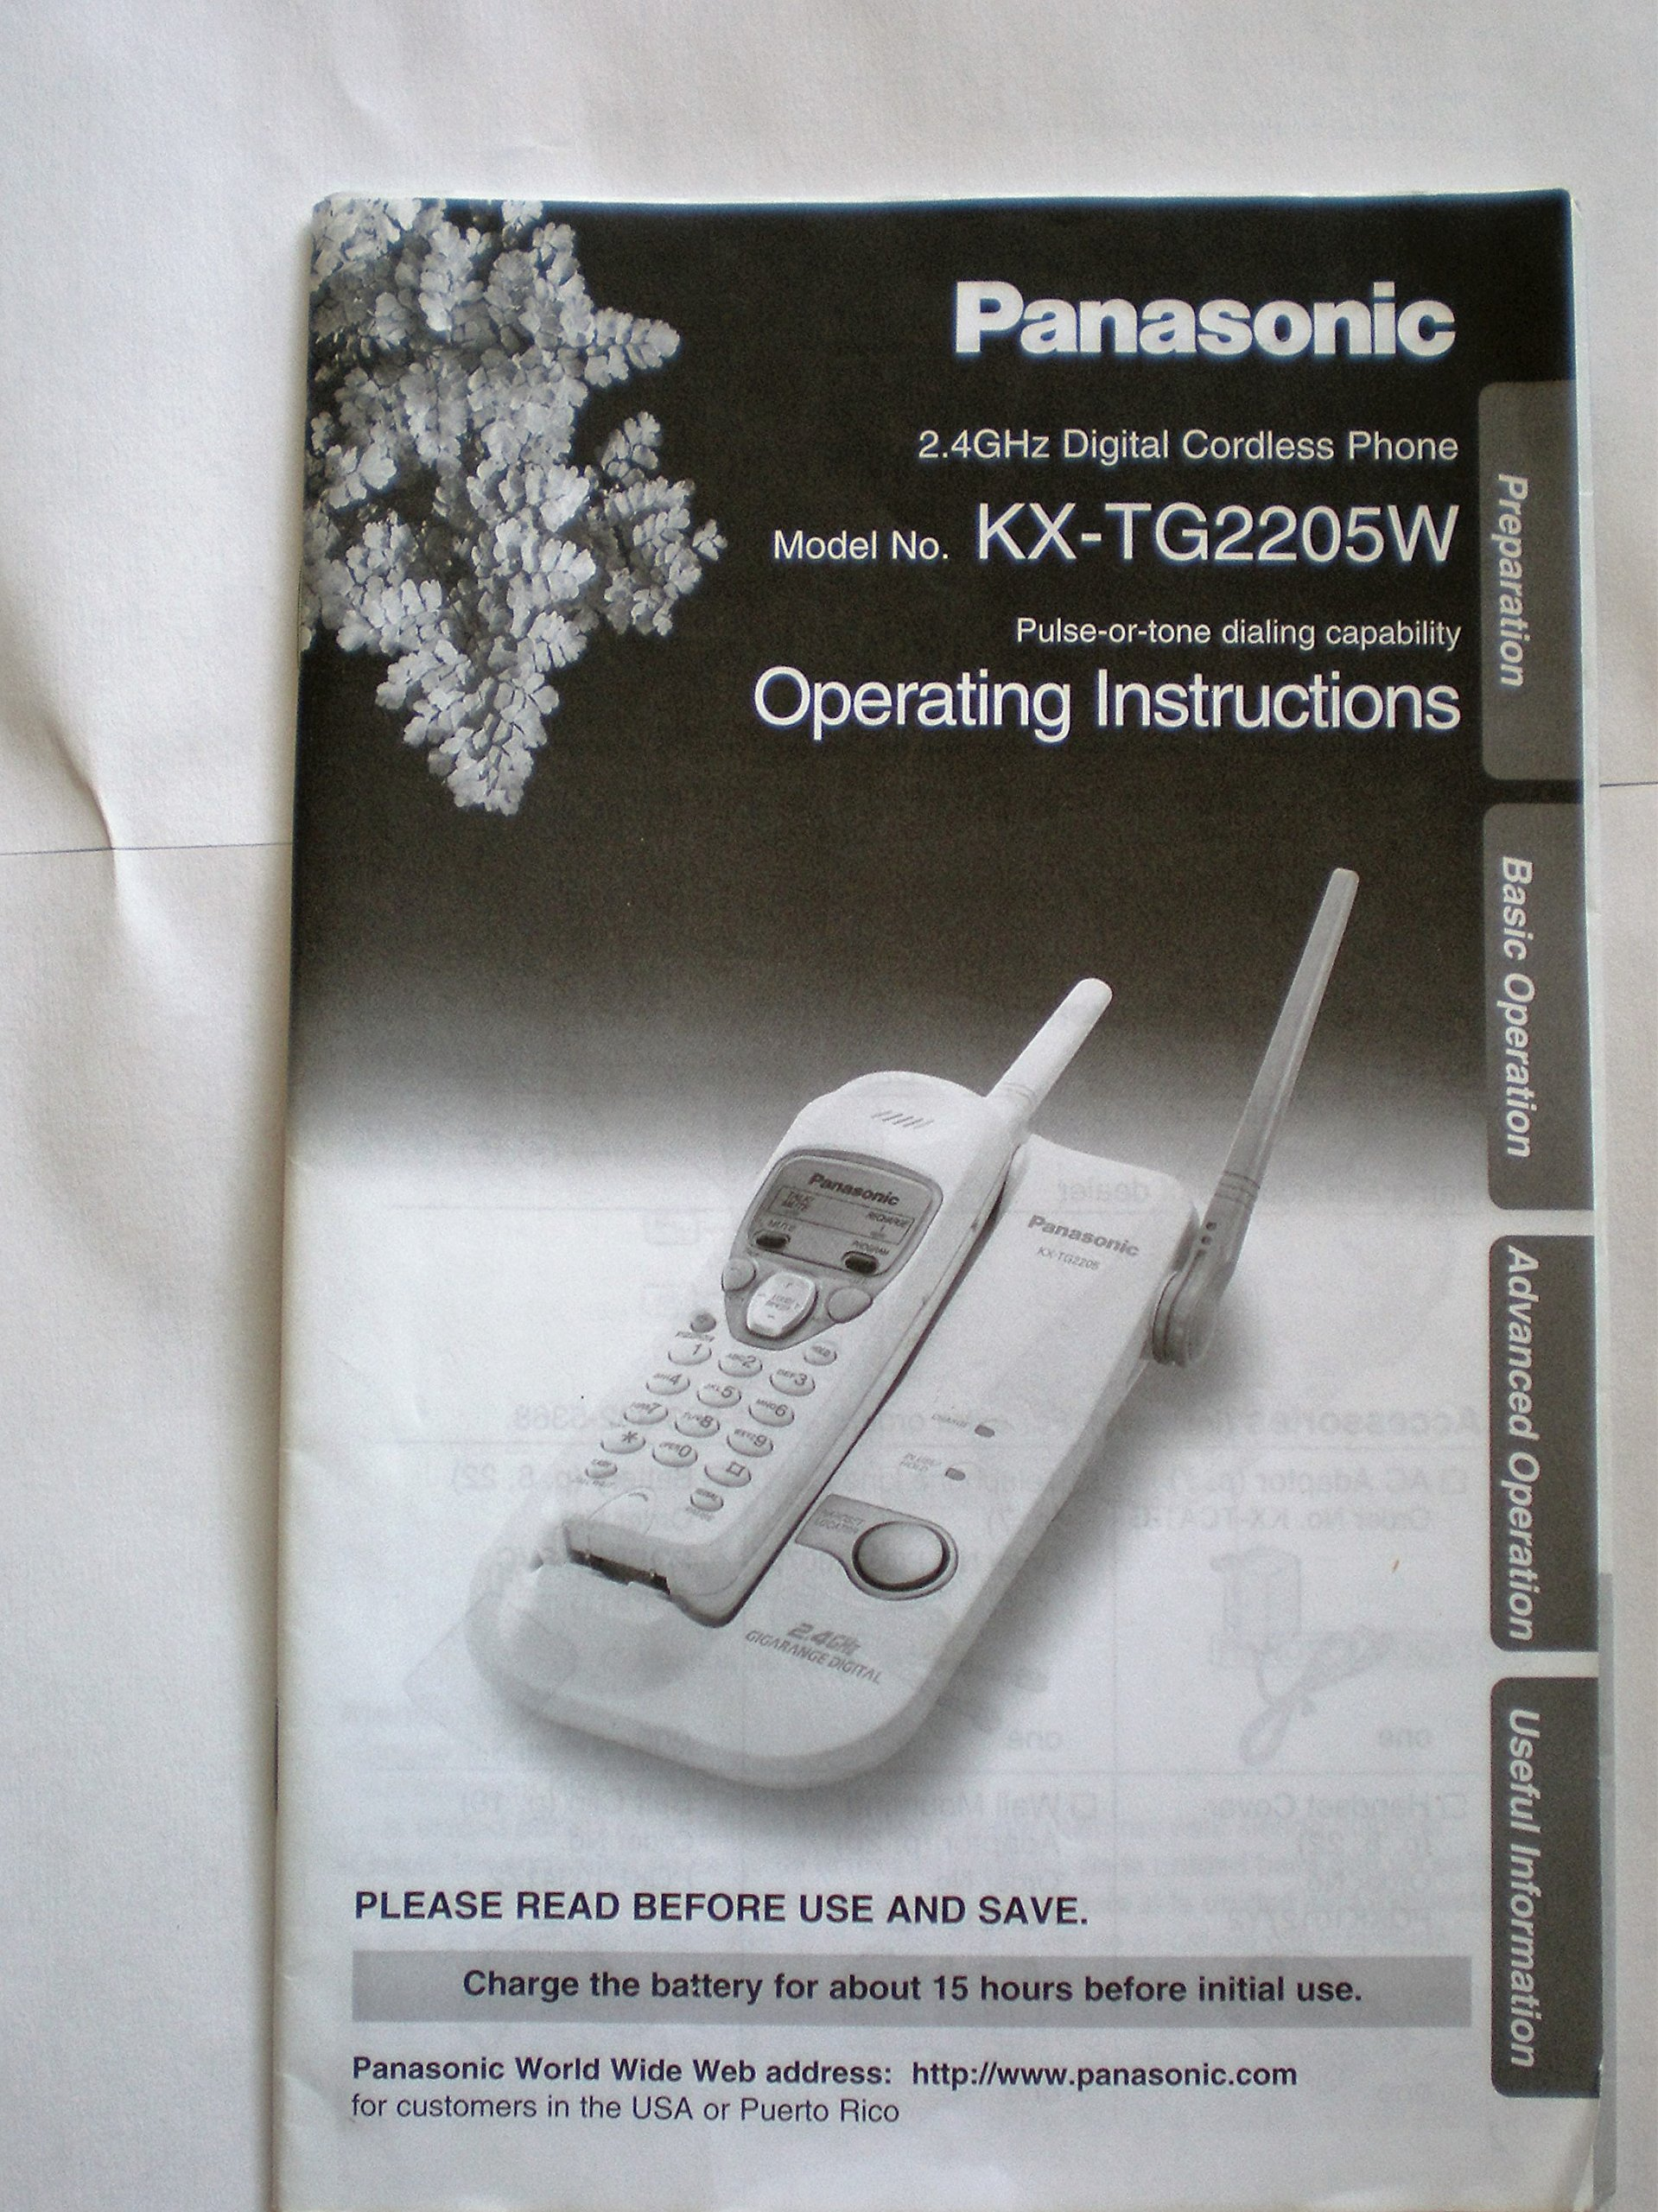 Panasonic 24 Ghz Digital Cordless Phone Model No Kx Tg22005w